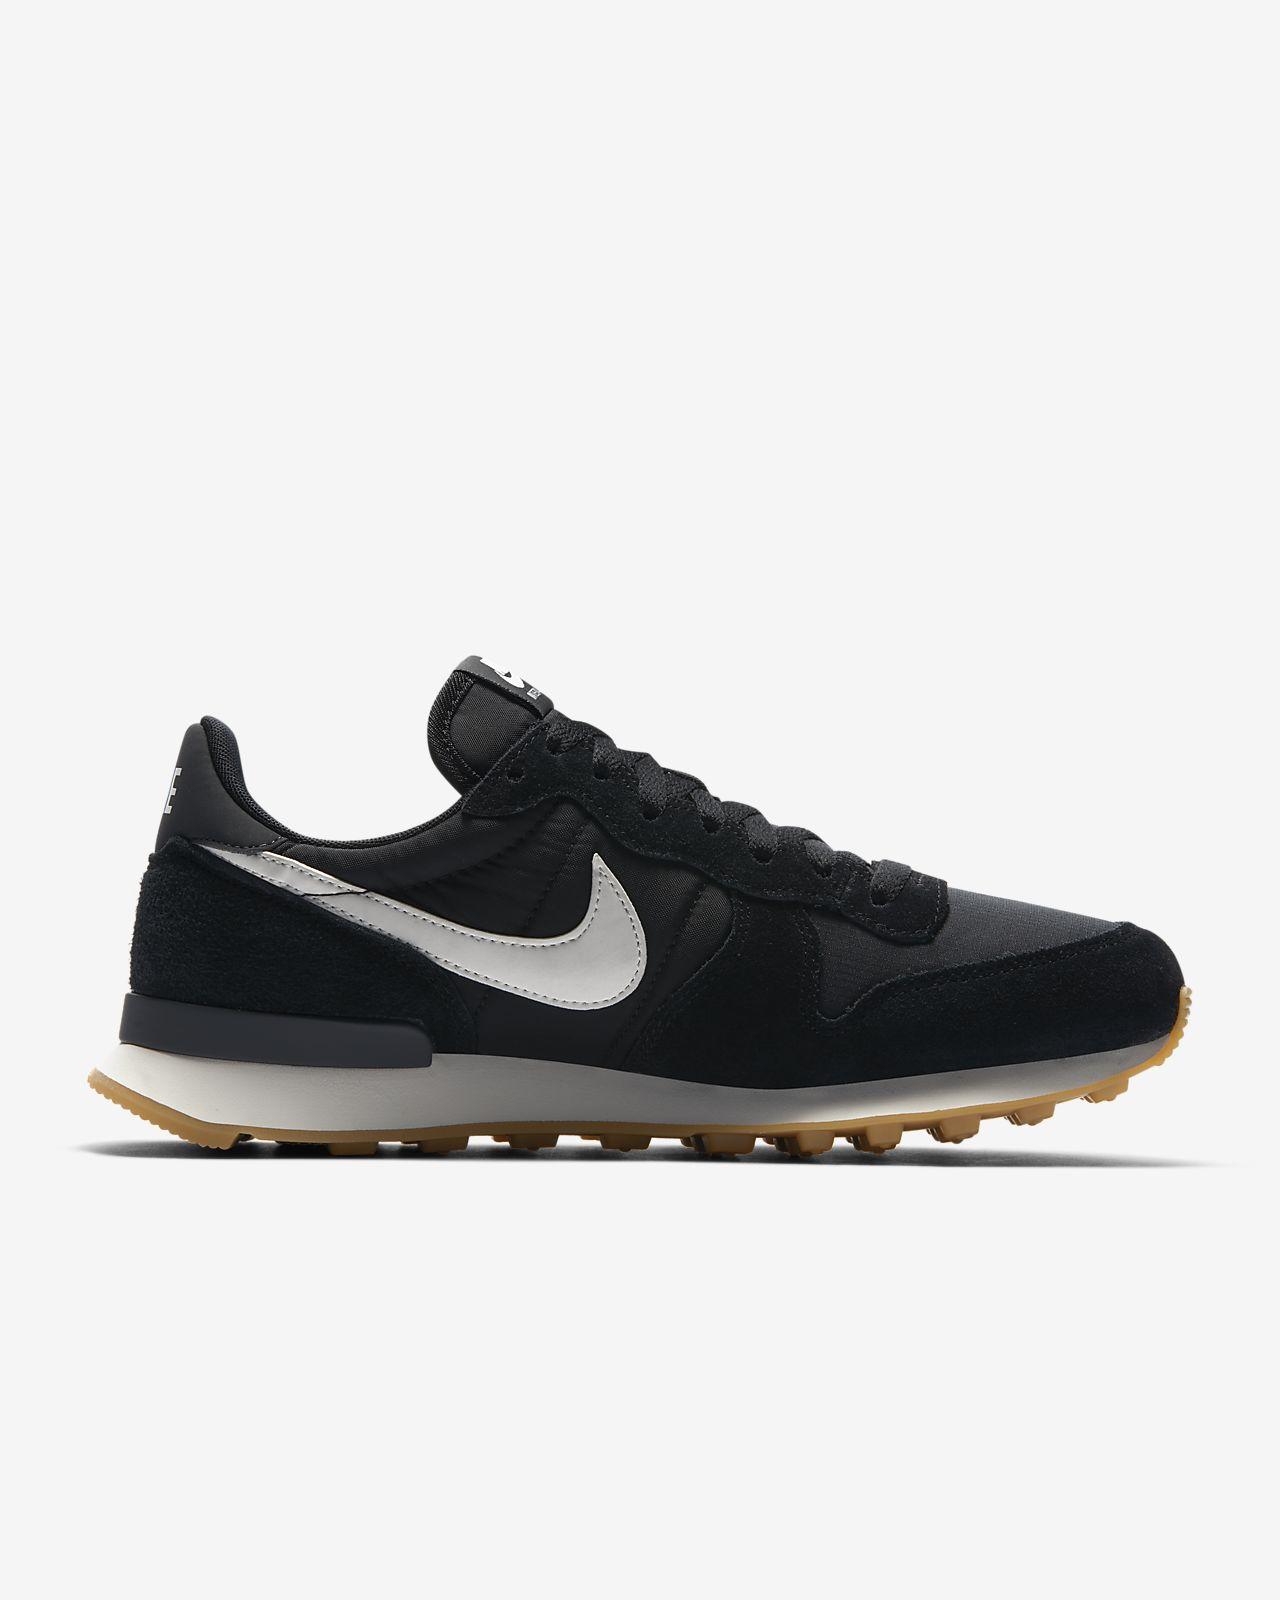 Designer Nike Internationalist 828407 021 Schwarz Sneakers